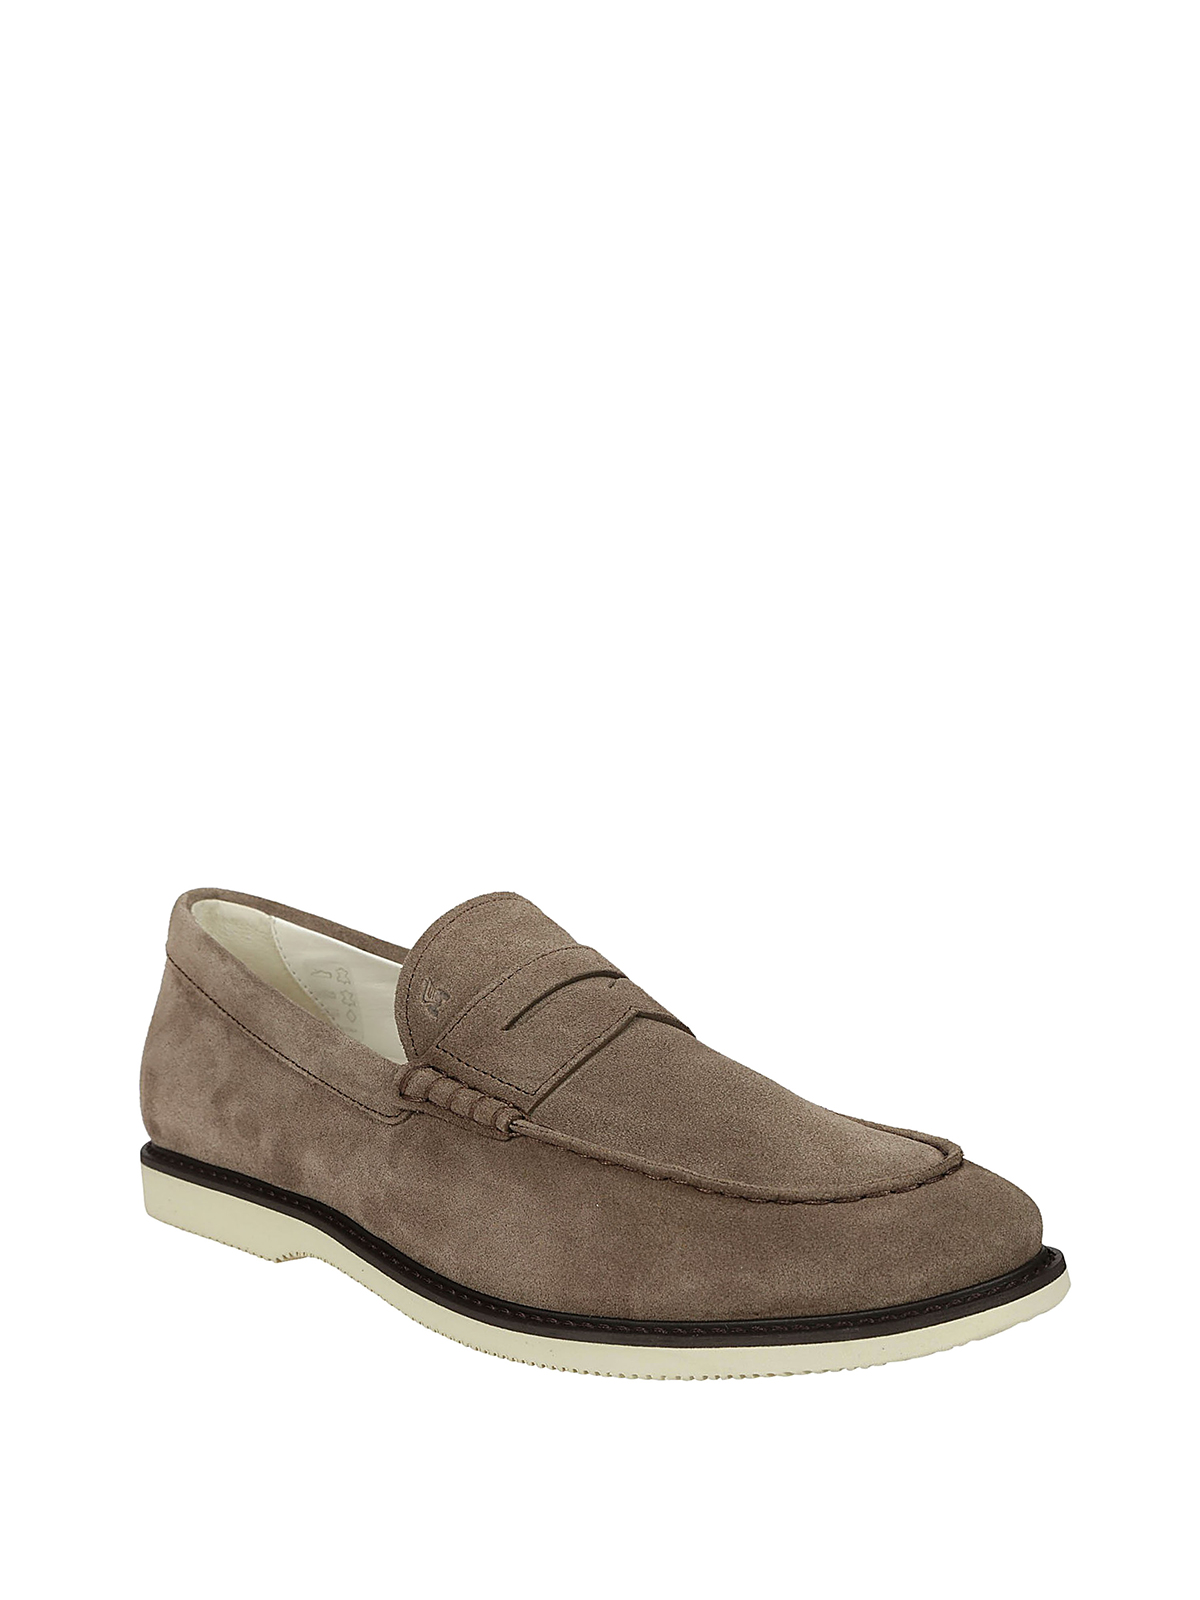 0529d73b05f light brown suede loafers mens light brown suede loafers by loafers slippers